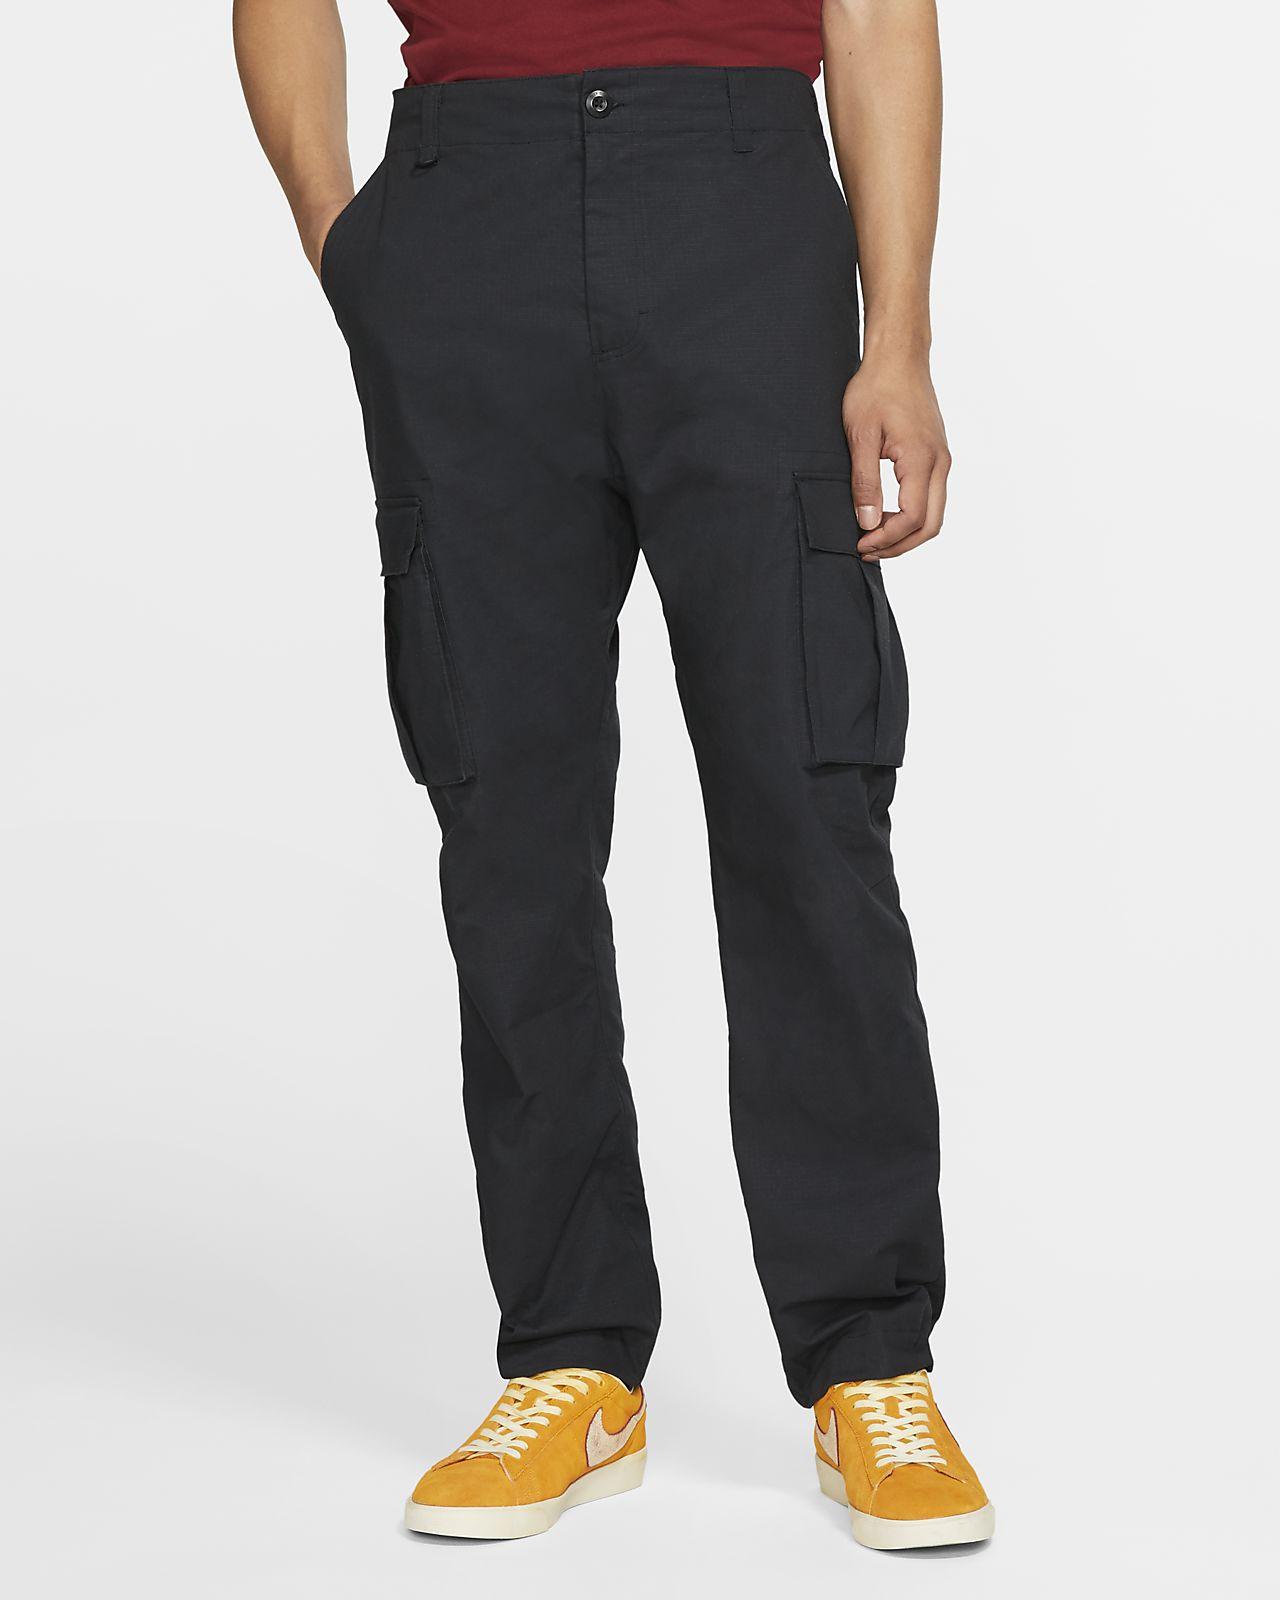 Pantalones de skateboarding Nike SB Flex FTM